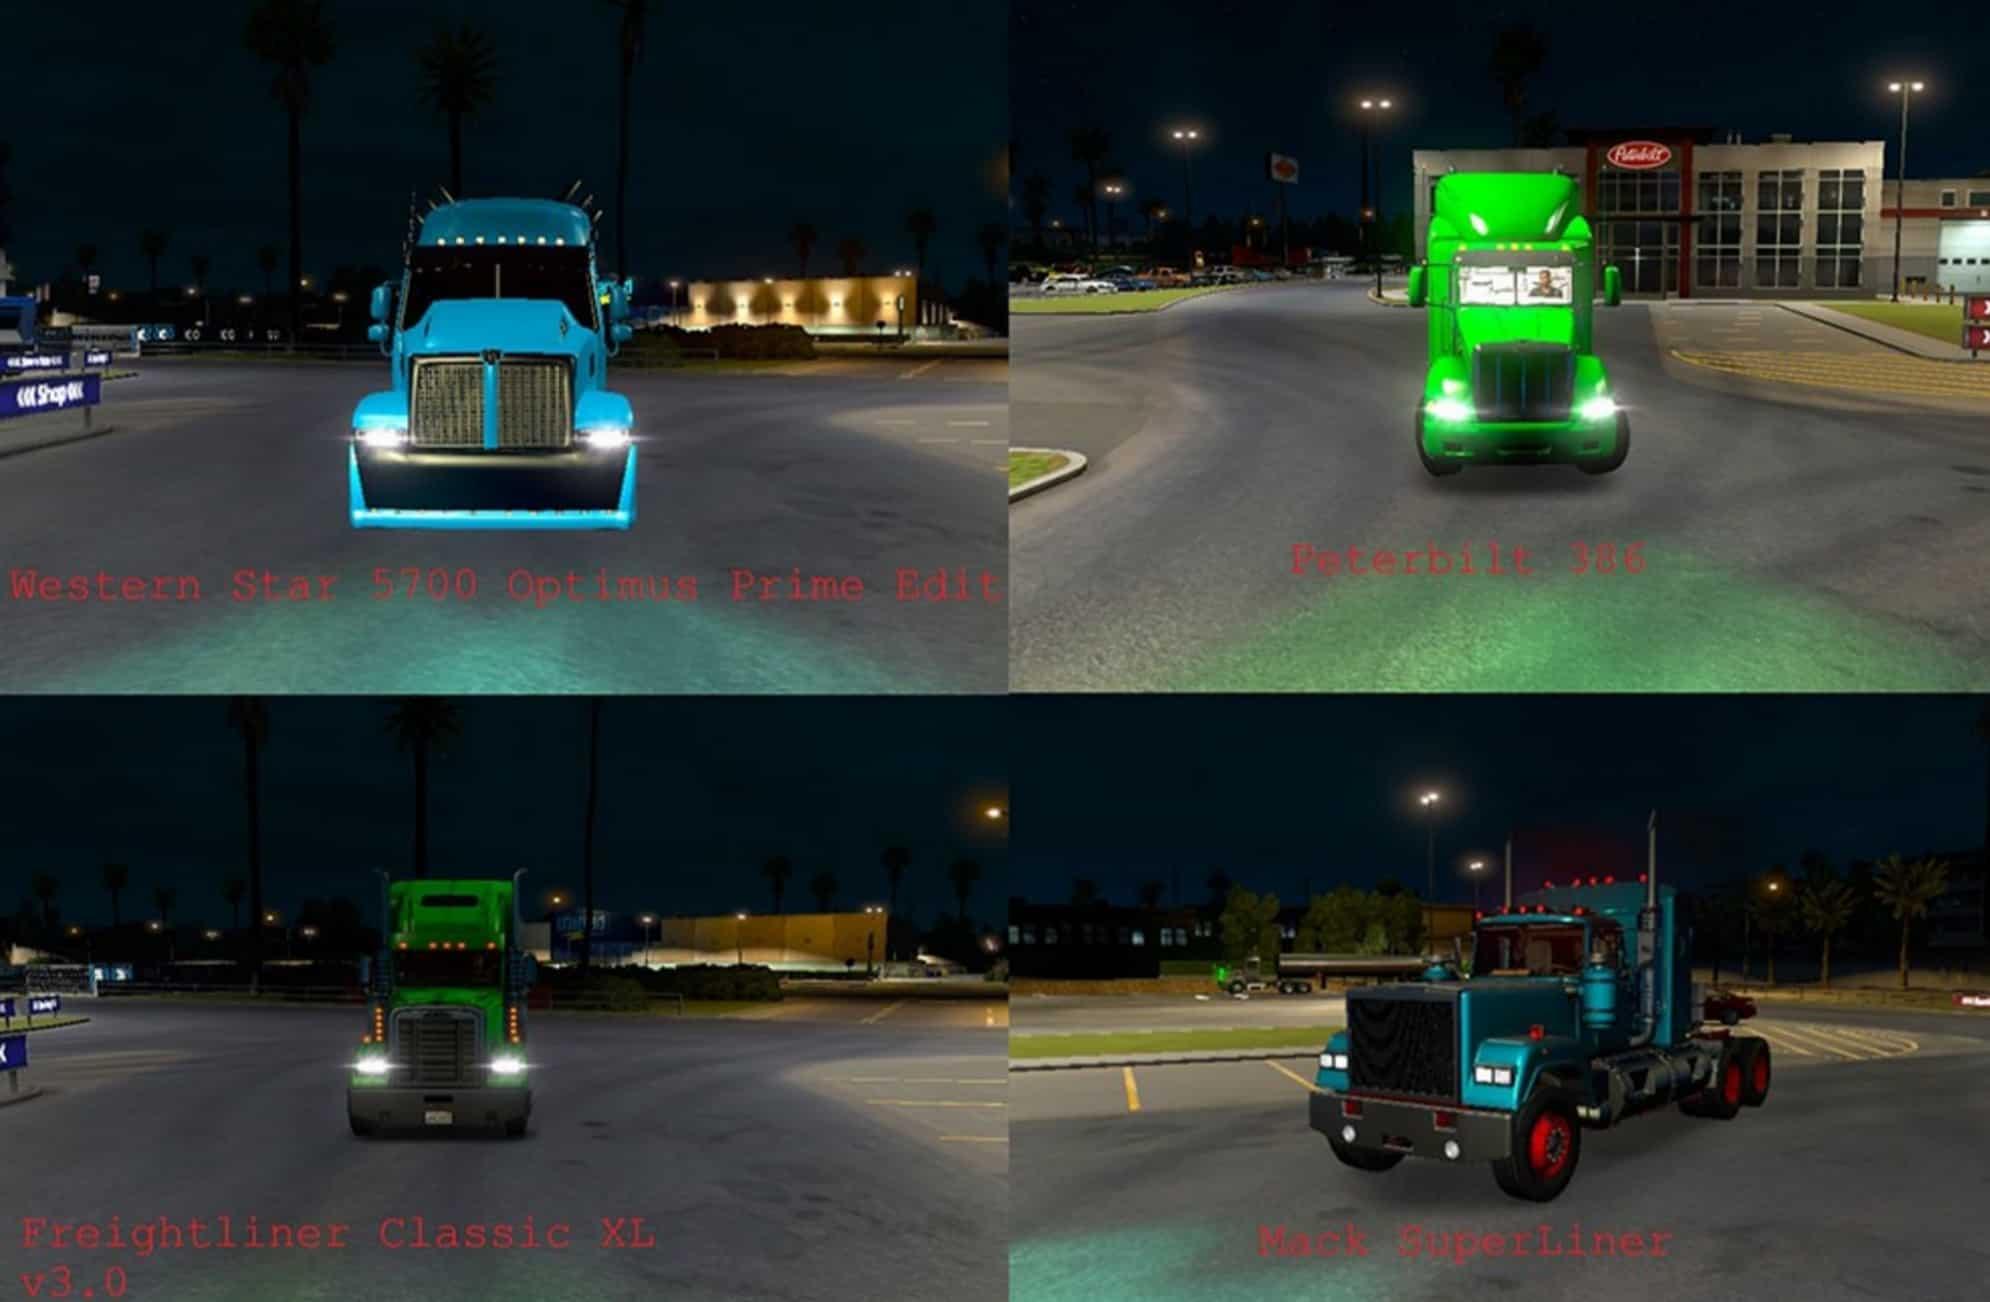 ATS 28 Trucks Xenon Light Turquoise u0026 Light Green Pack v 3.0 Mod & ATS 28 Trucks Xenon Light Turquoise u0026 Light Green Pack v 3.0 Mod ... azcodes.com